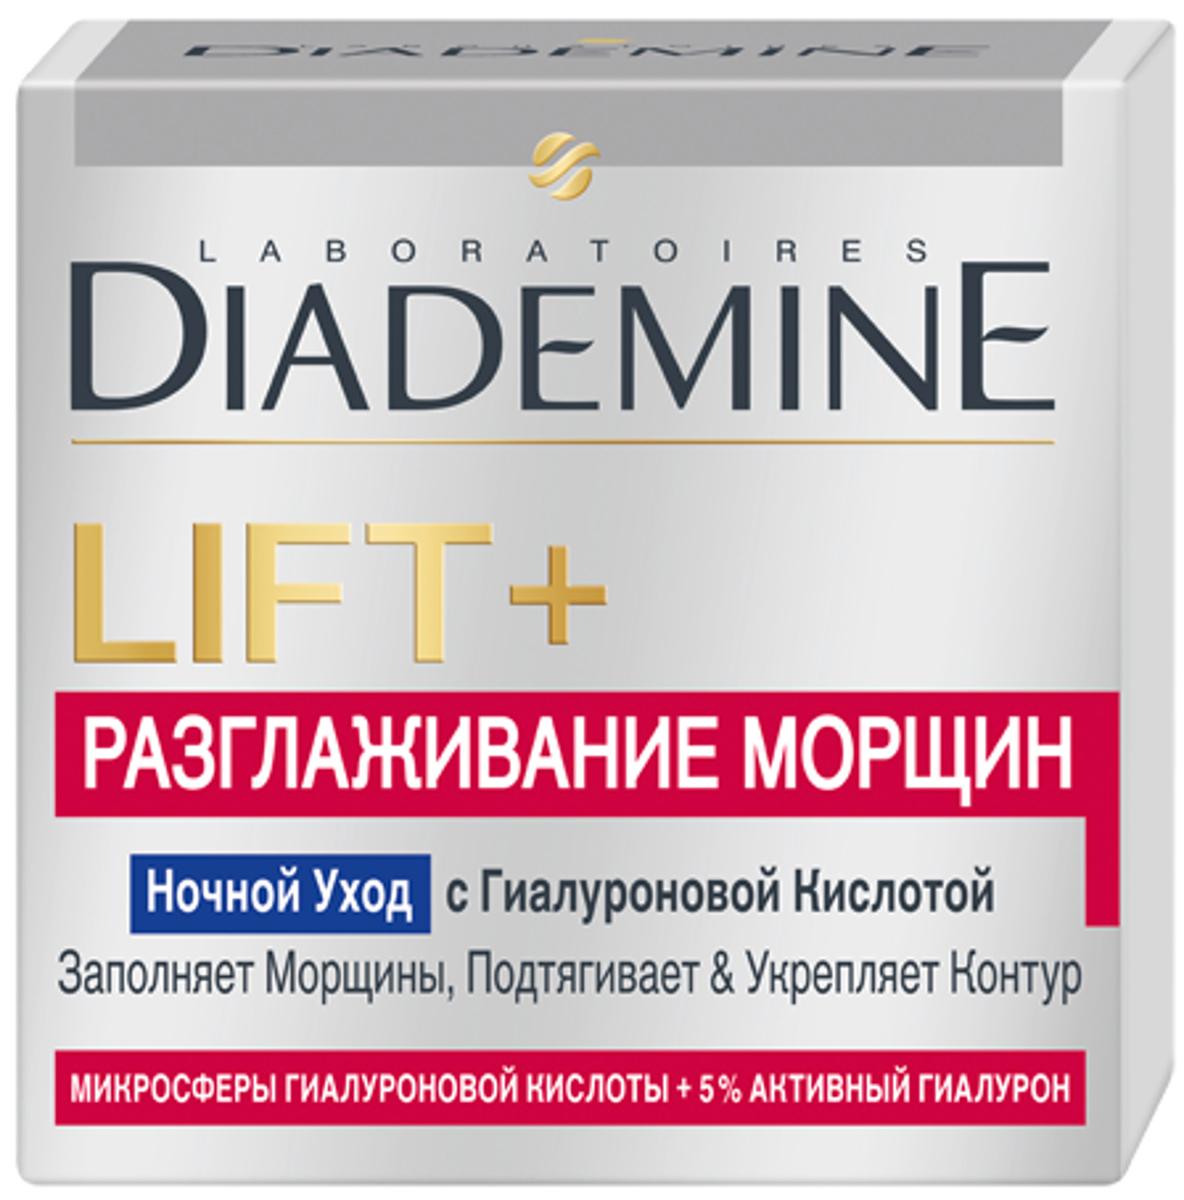 DIADEMINE LIFT+ Superfiller Разглаживание морщин Ночной крем, 50мл diademine крем для лица ночной lift питание от морщин 50 мл